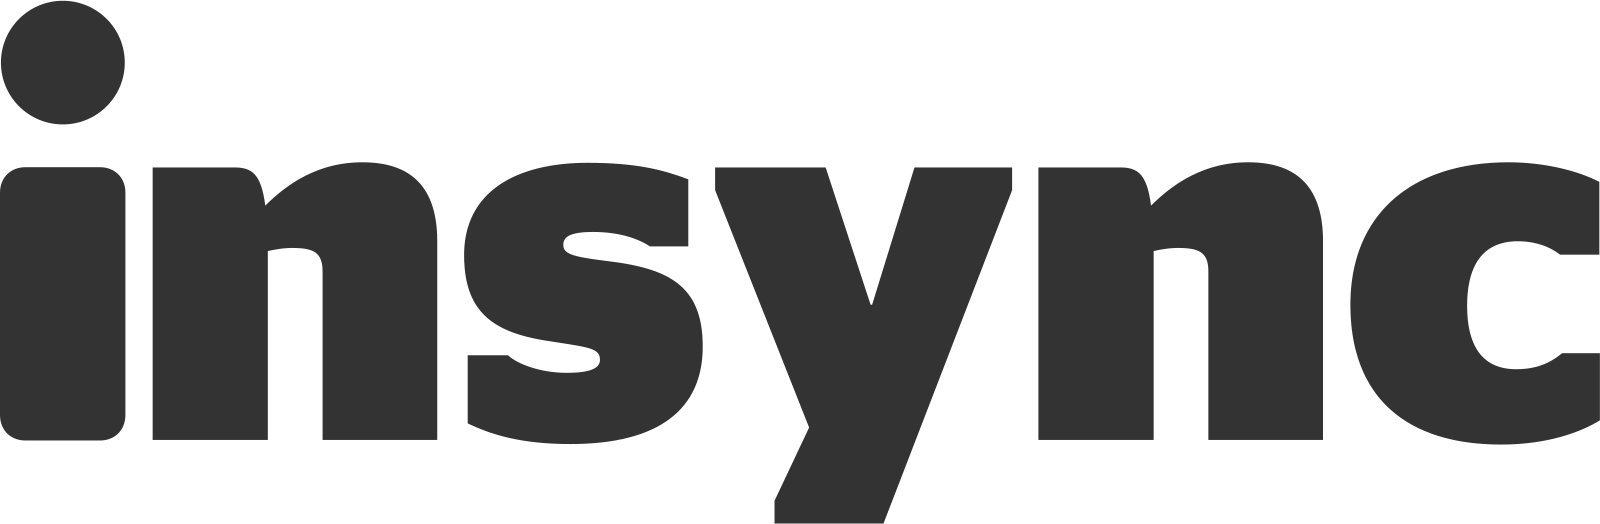 Image result for insync logo